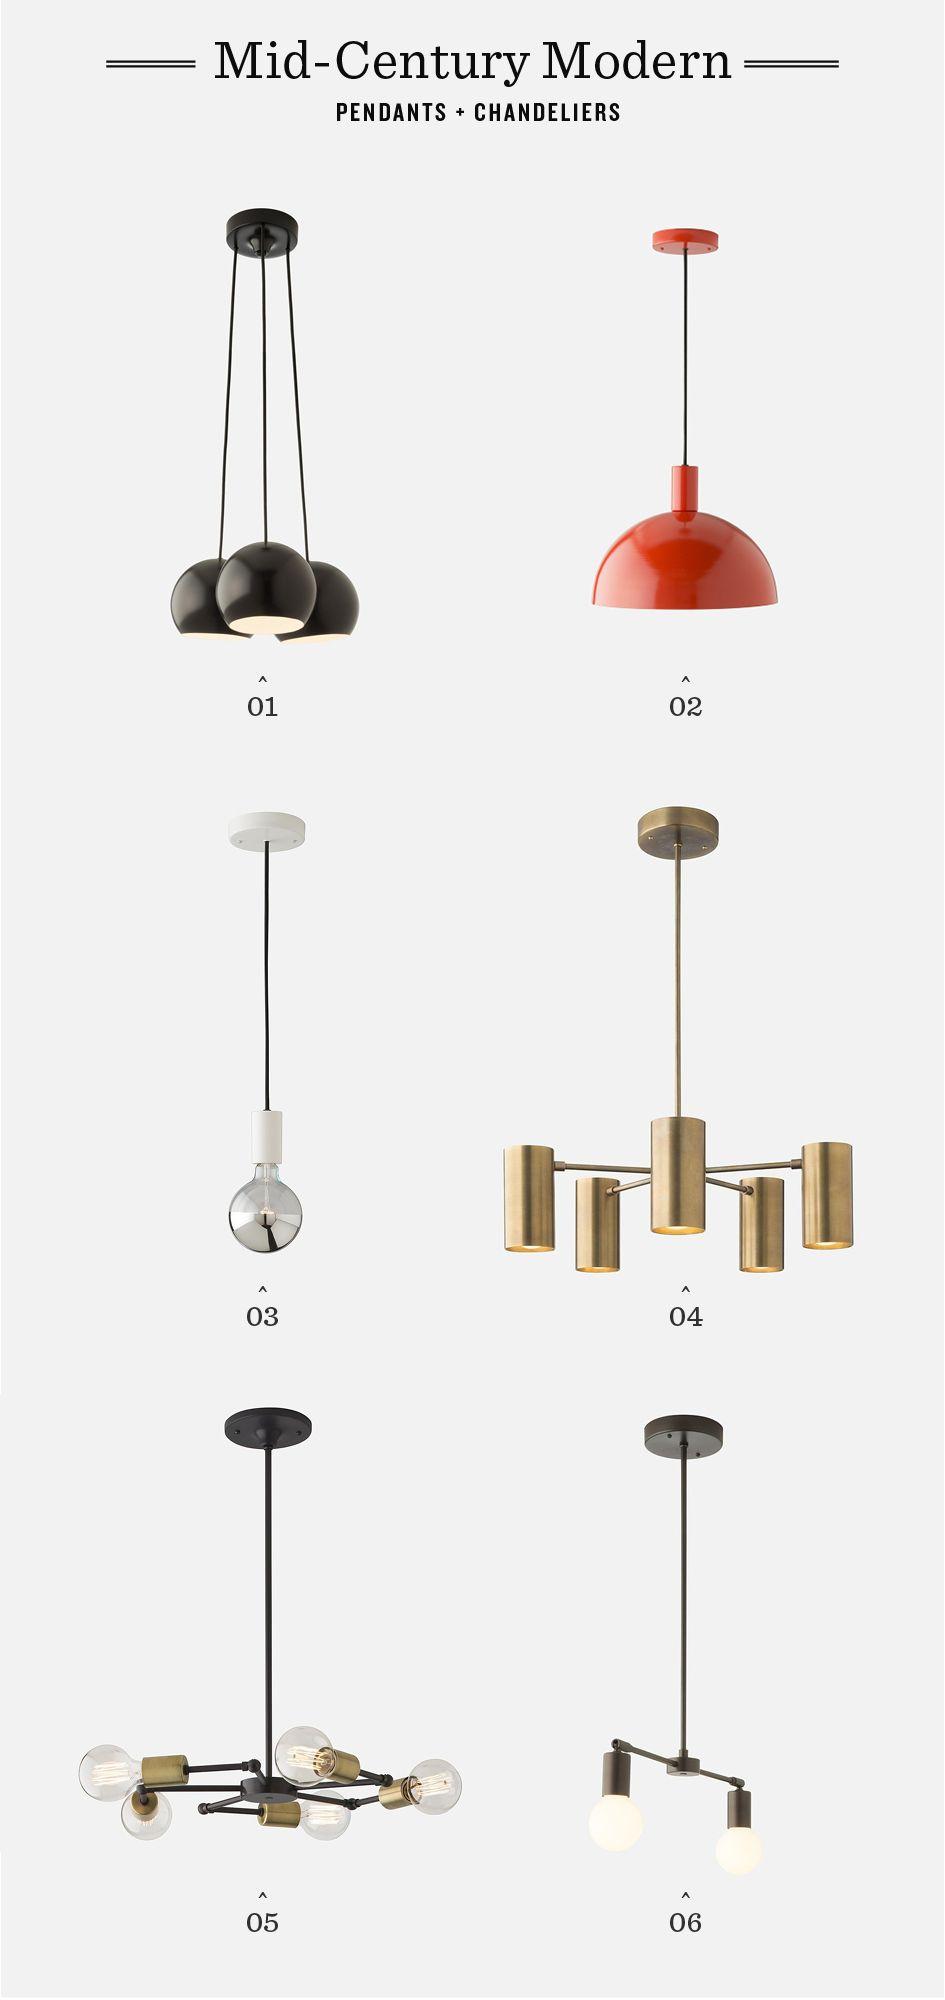 Midcentury modern pendants u chandeliers by schoolhouse electric